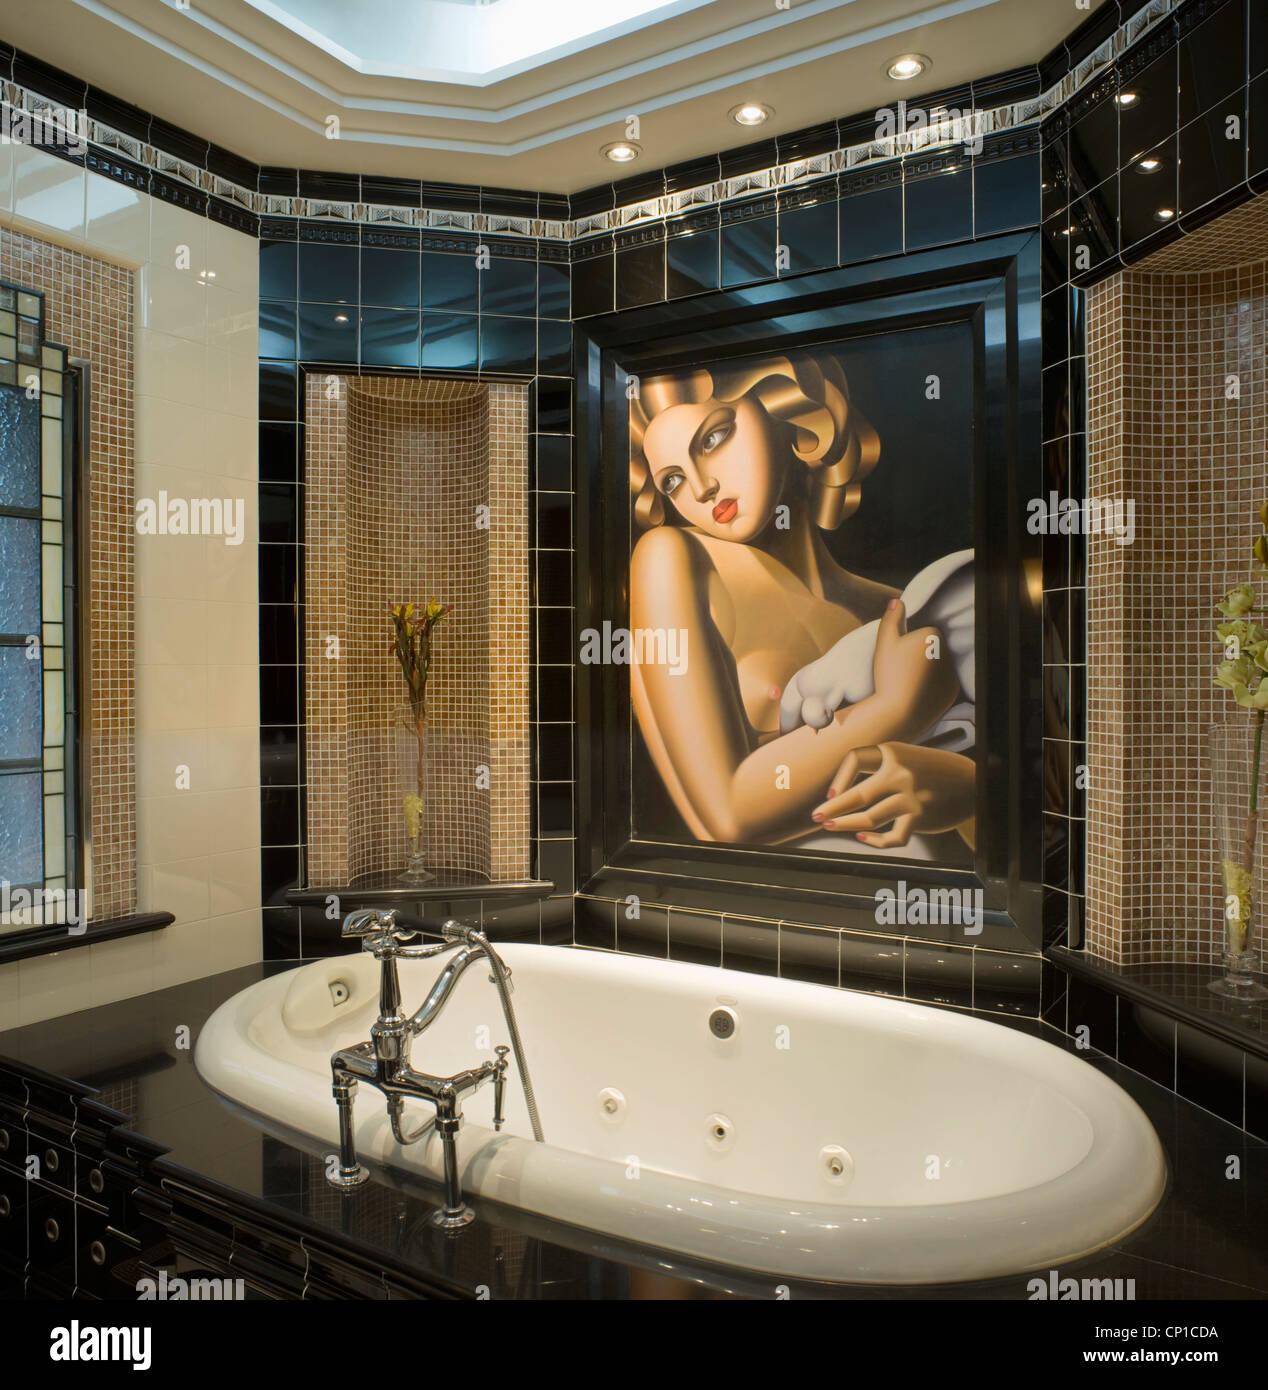 Bathroom in art deco style recently restored 1930s british for 1930 bathroom tile ideas